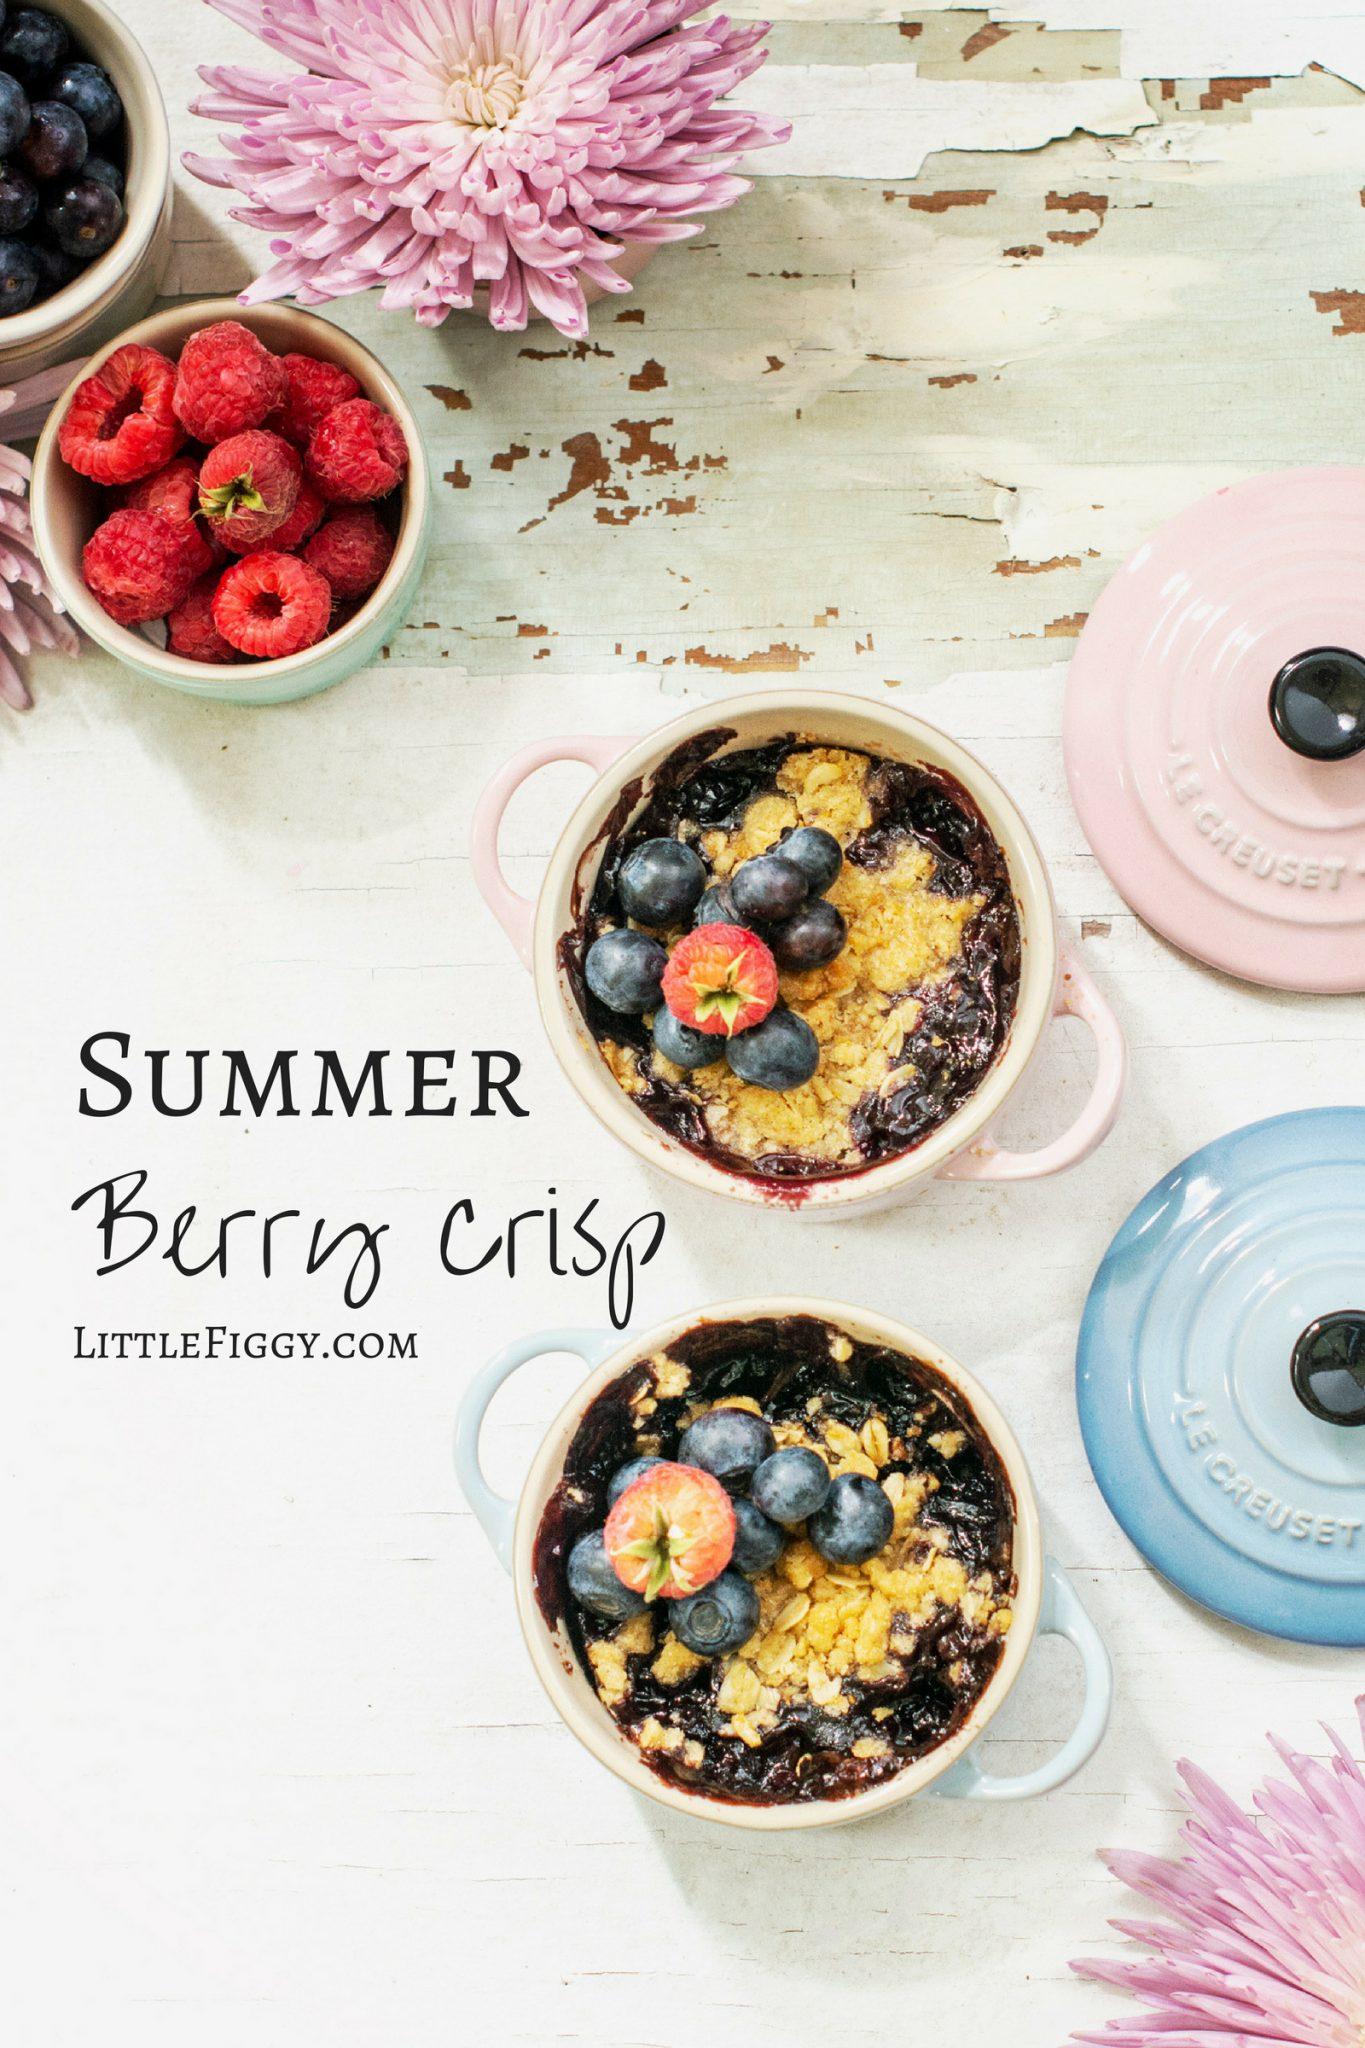 MY FAVORITE SUMMER BERRY CRISP RECIPE LITTLE FIGGY FOOD